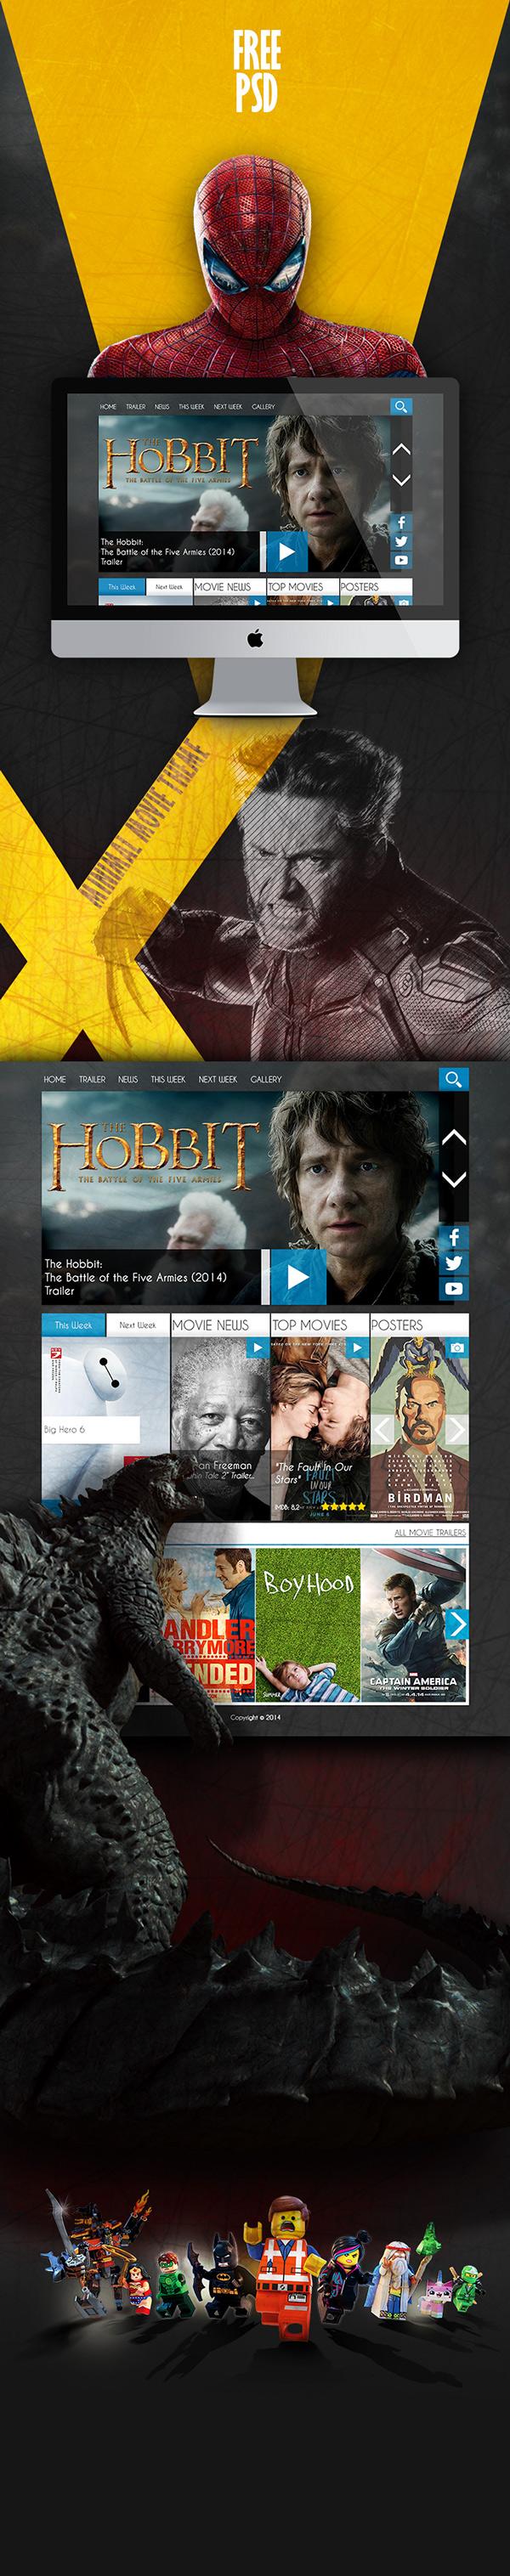 Free Movie Website PSD Template Movie Theme